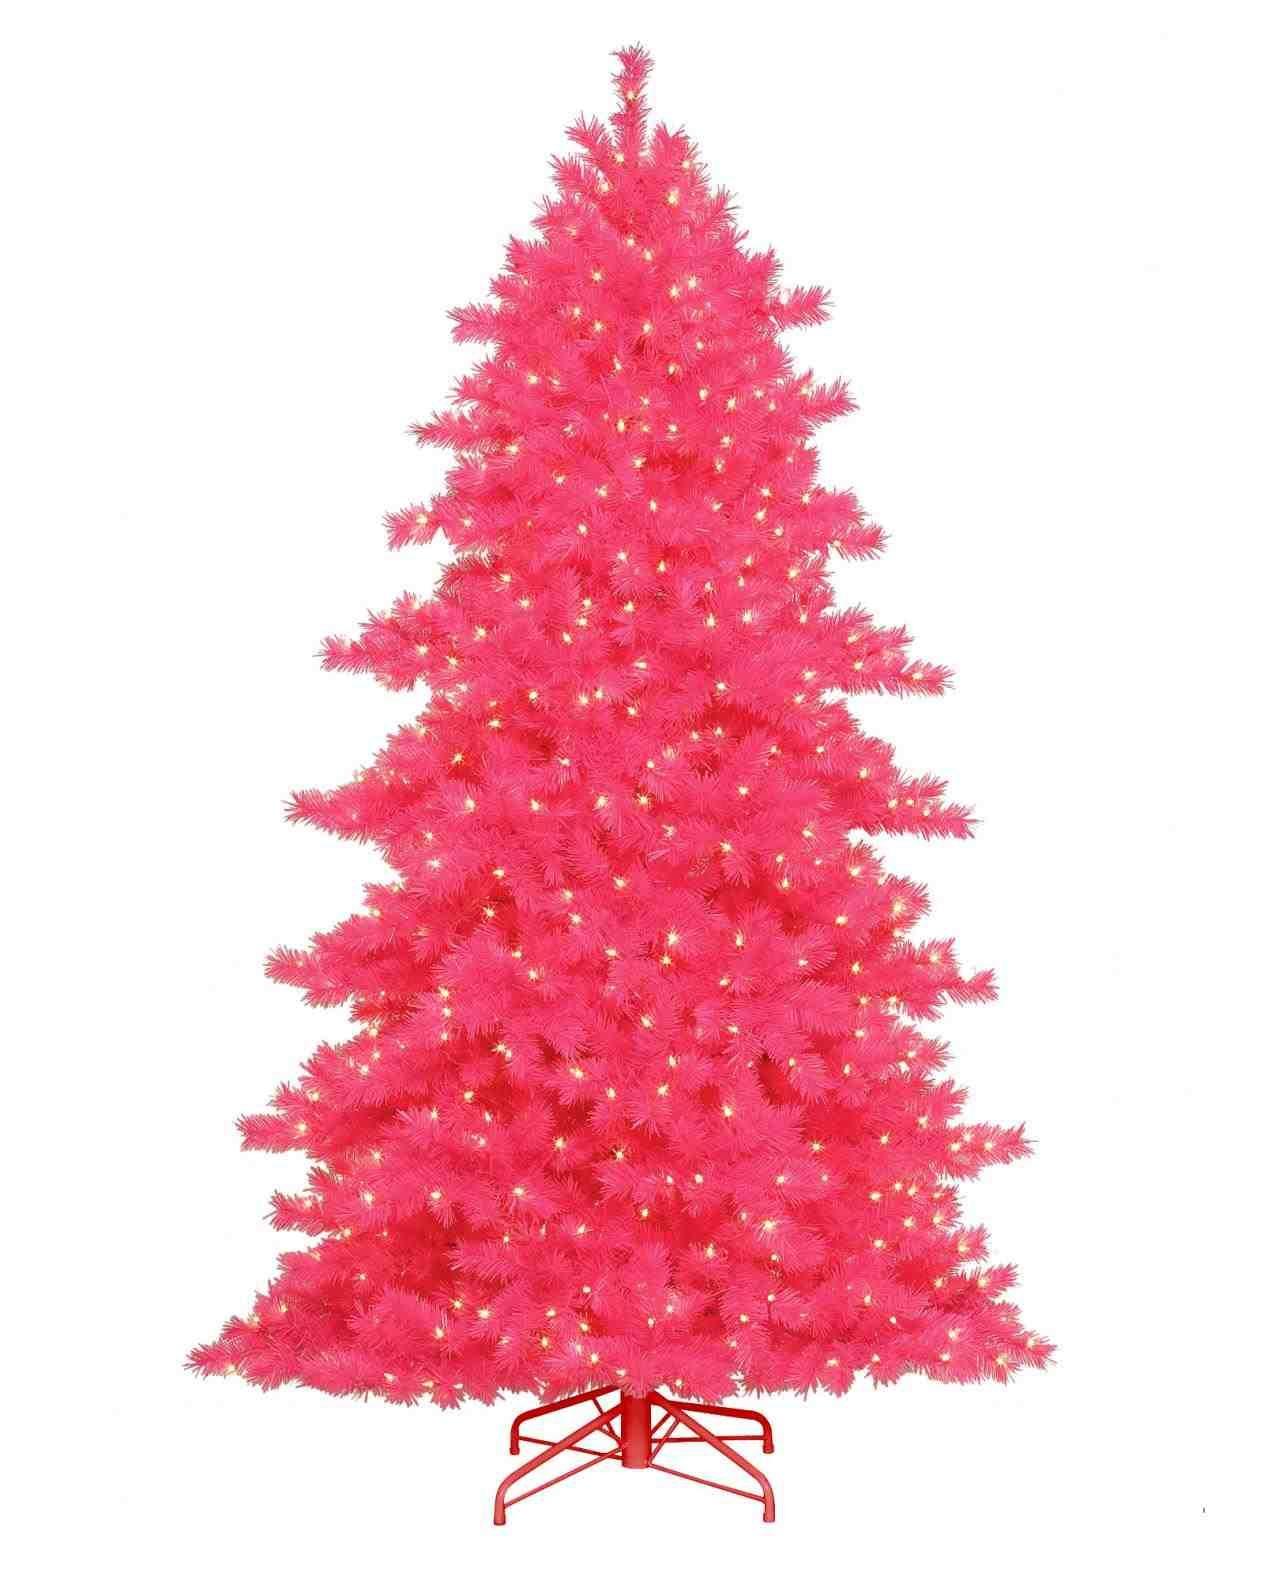 Christmas Tree New Post Hot Pink